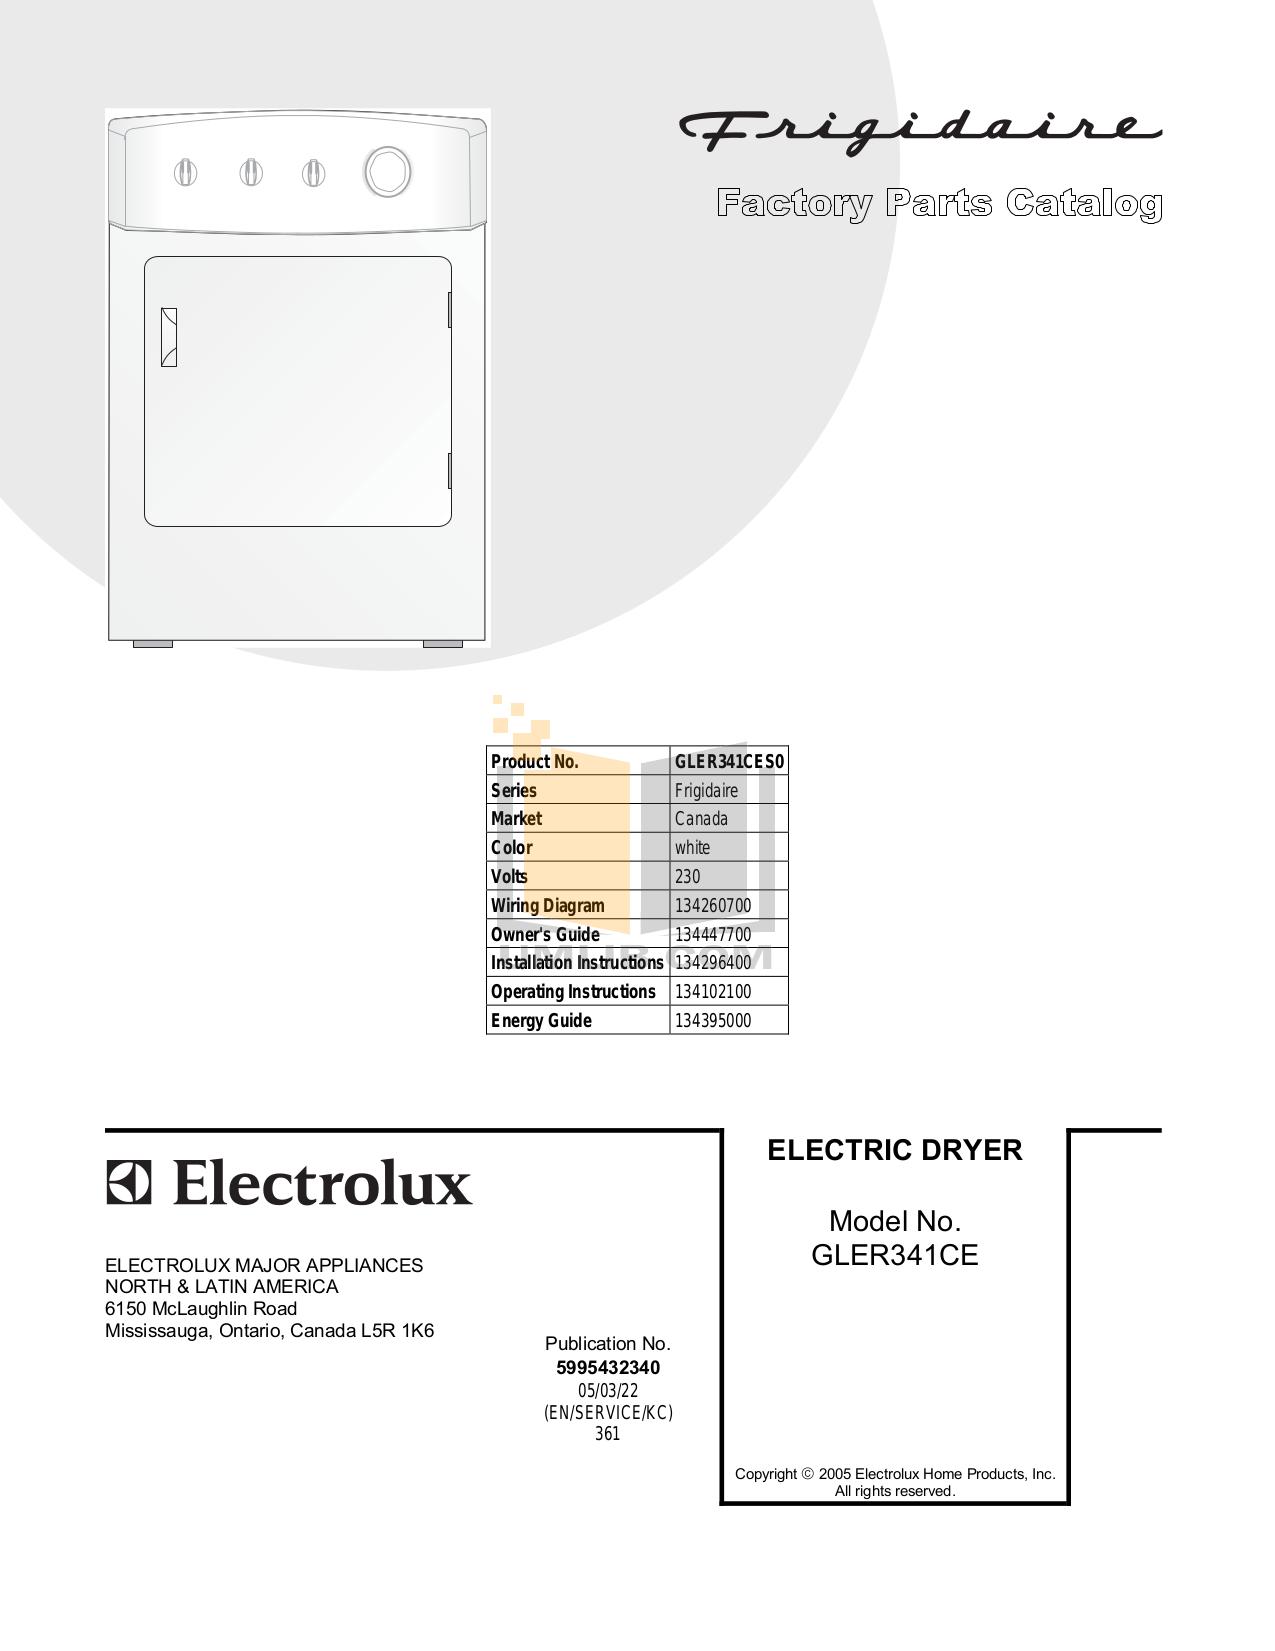 pdf for Frigidaire Dryer GLER341CES0 manual